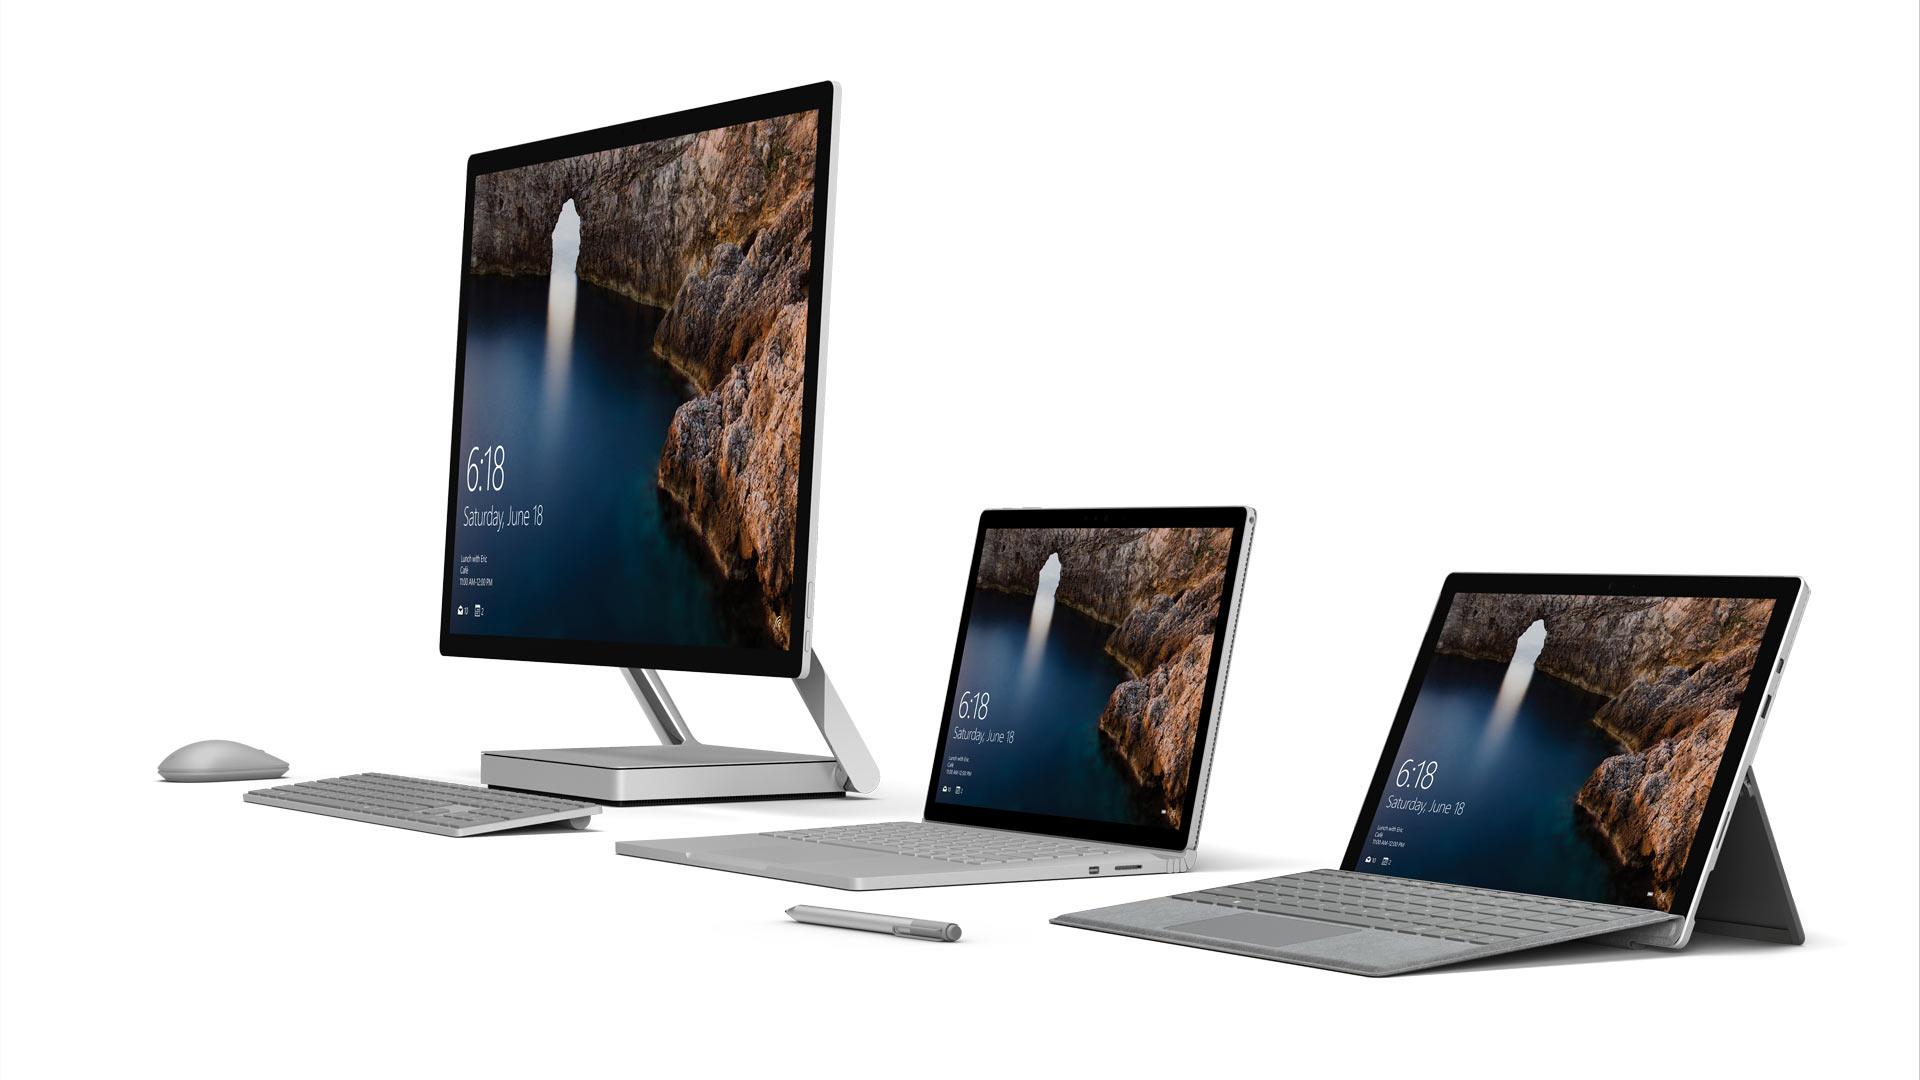 IT-in-Villingen-Schwenningen-Microsoft-Surface